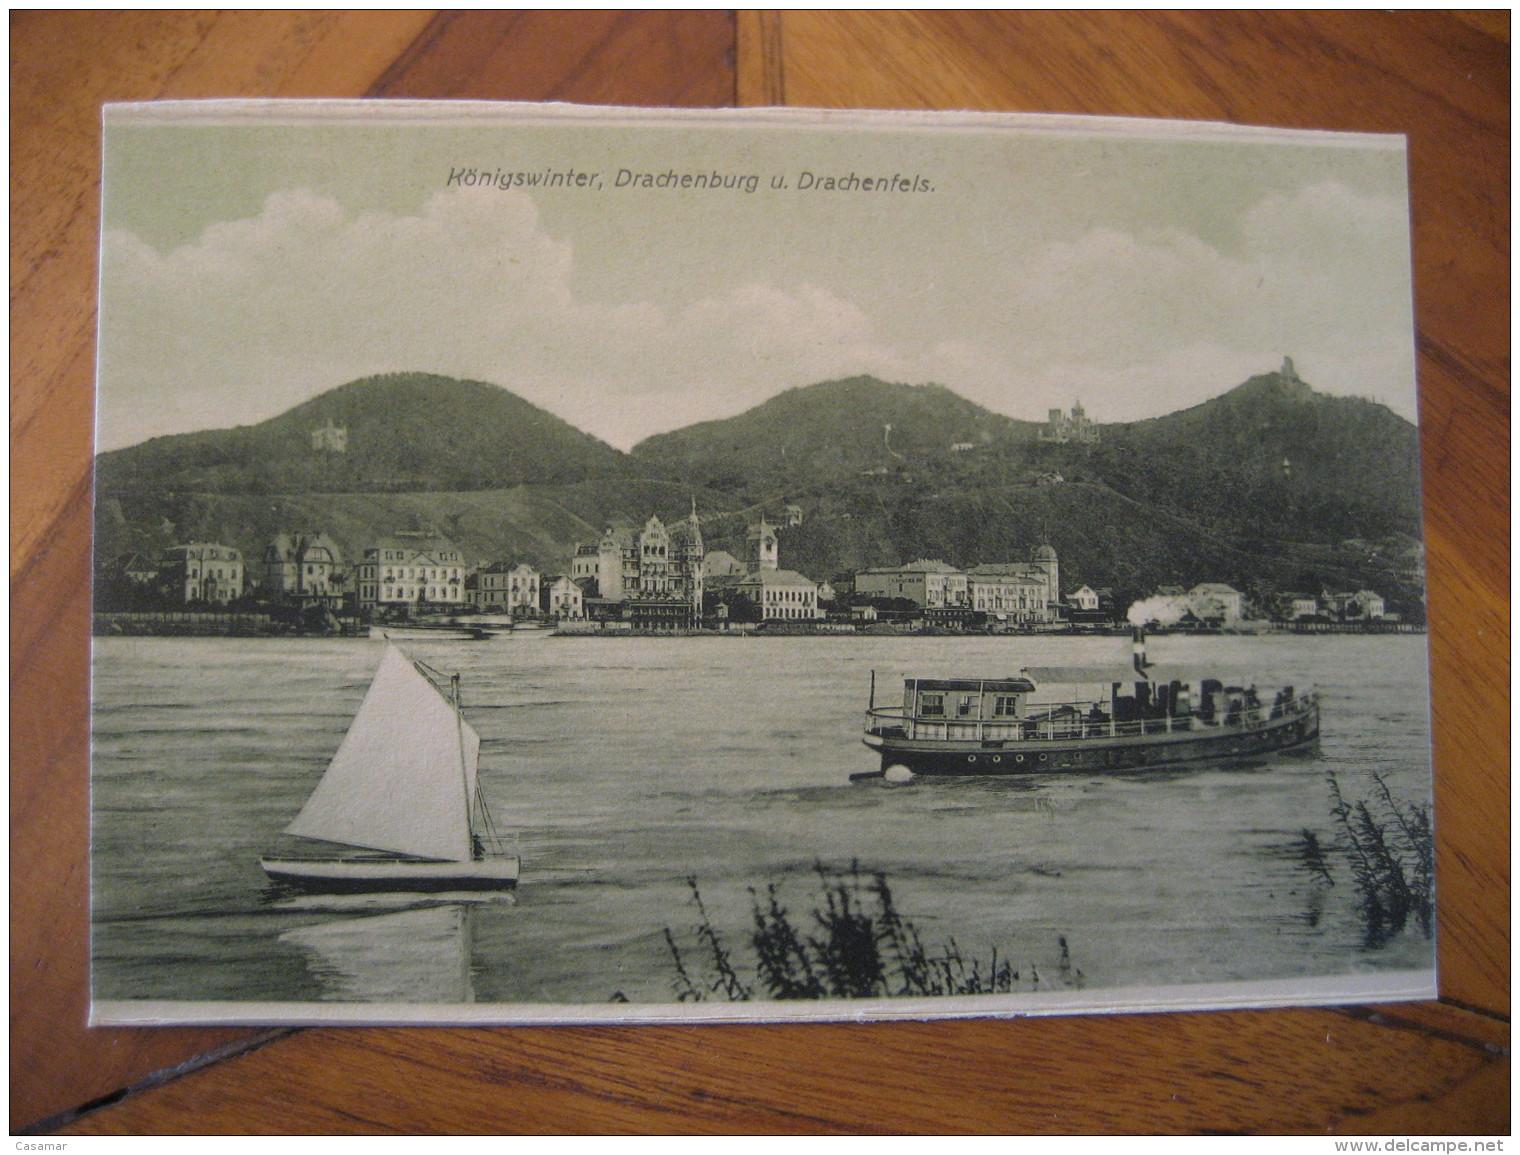 KONIGSWINTER Drachenburg Drachenfels Sailing Boat Ship Post Card North Rhine Westphalia Koln Rhein Sieg Kries Germany - Koenigswinter